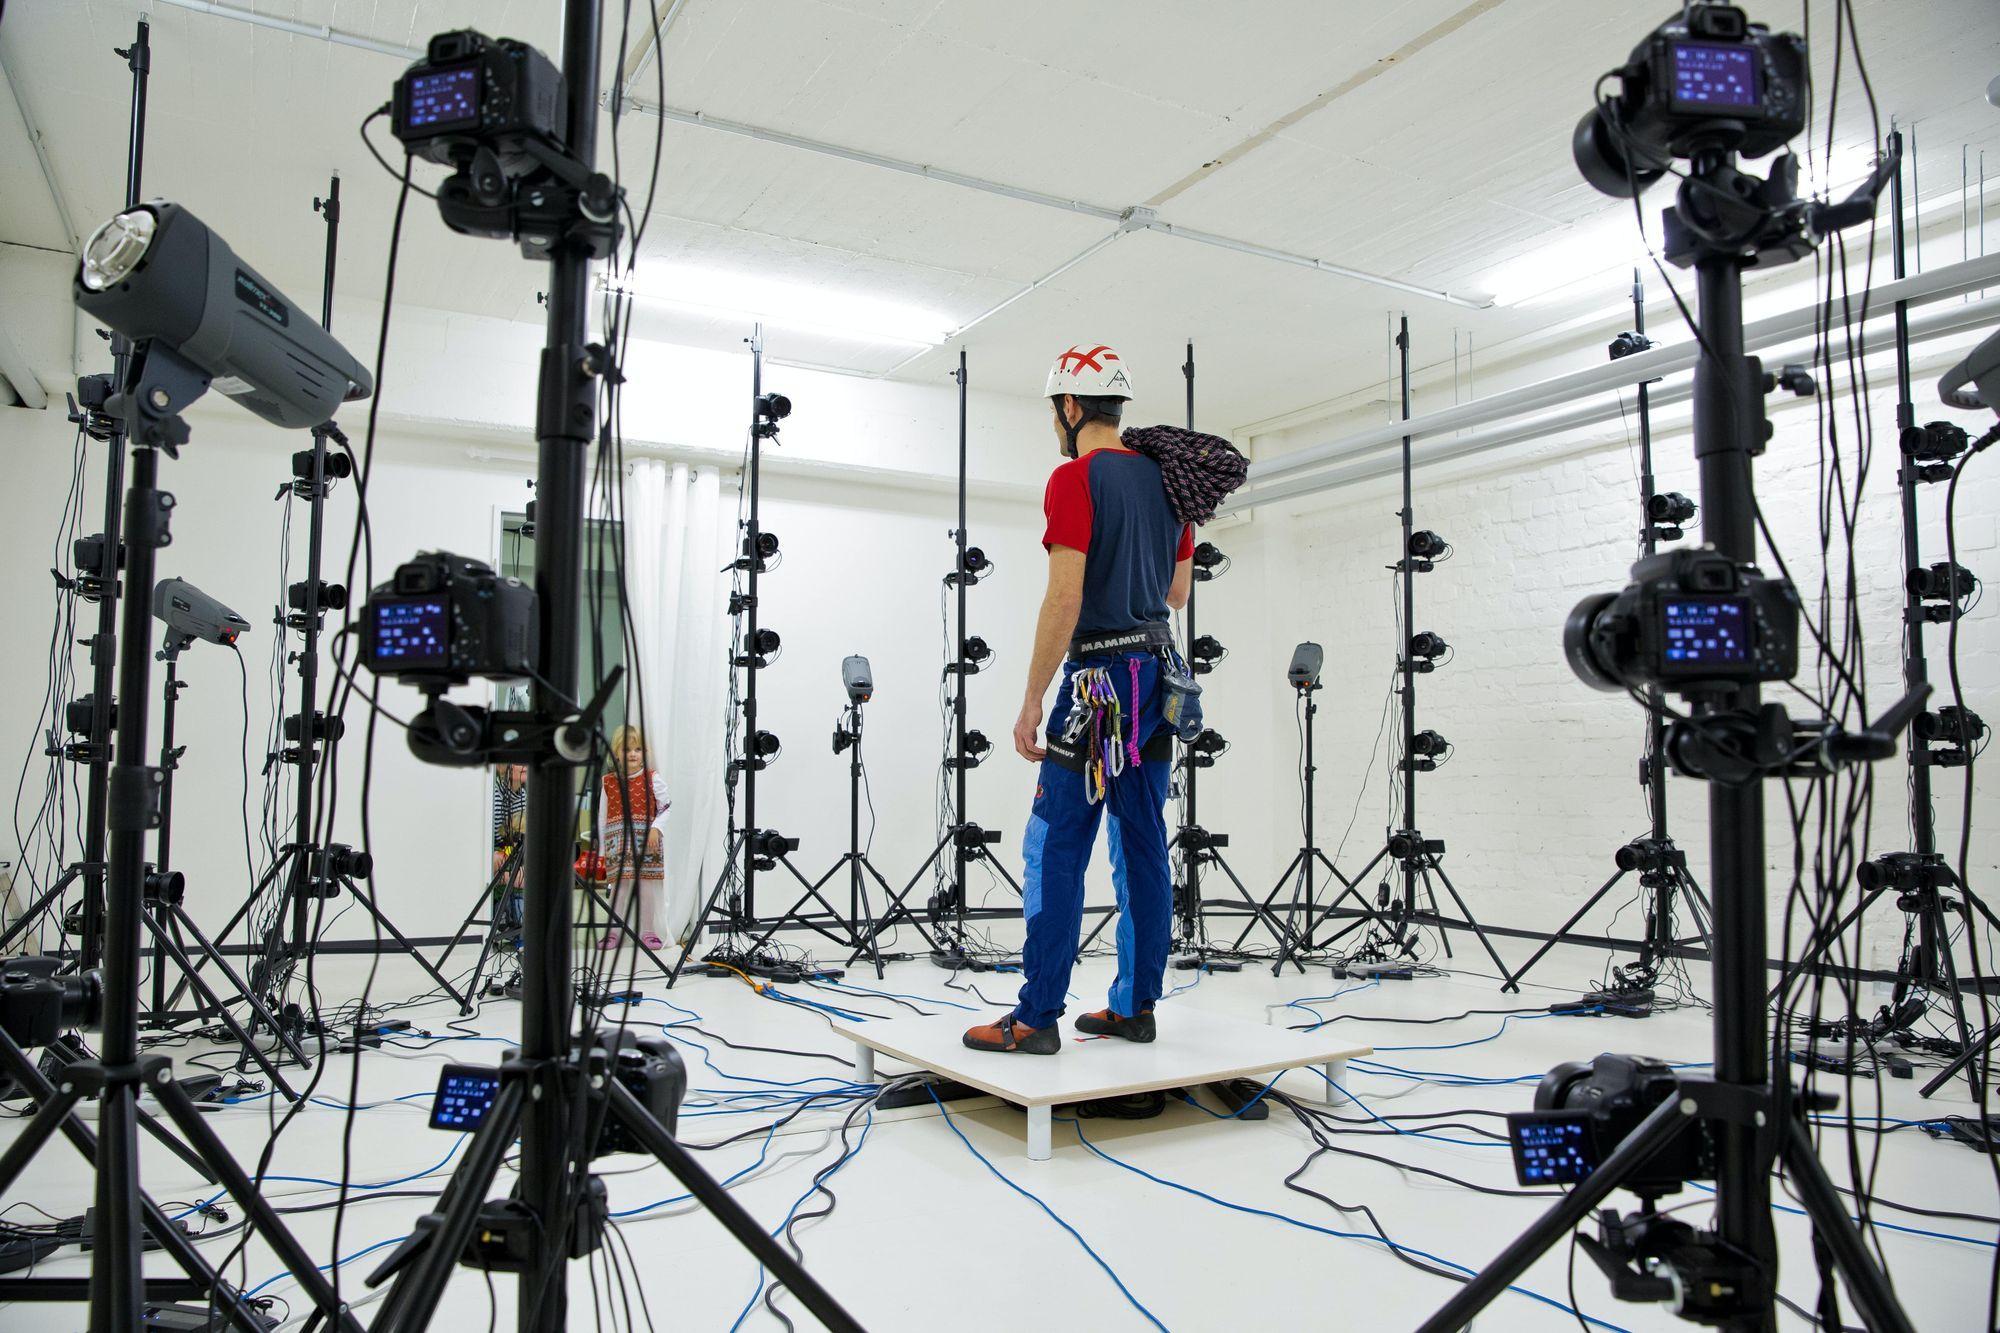 Behind-the-scenes photo